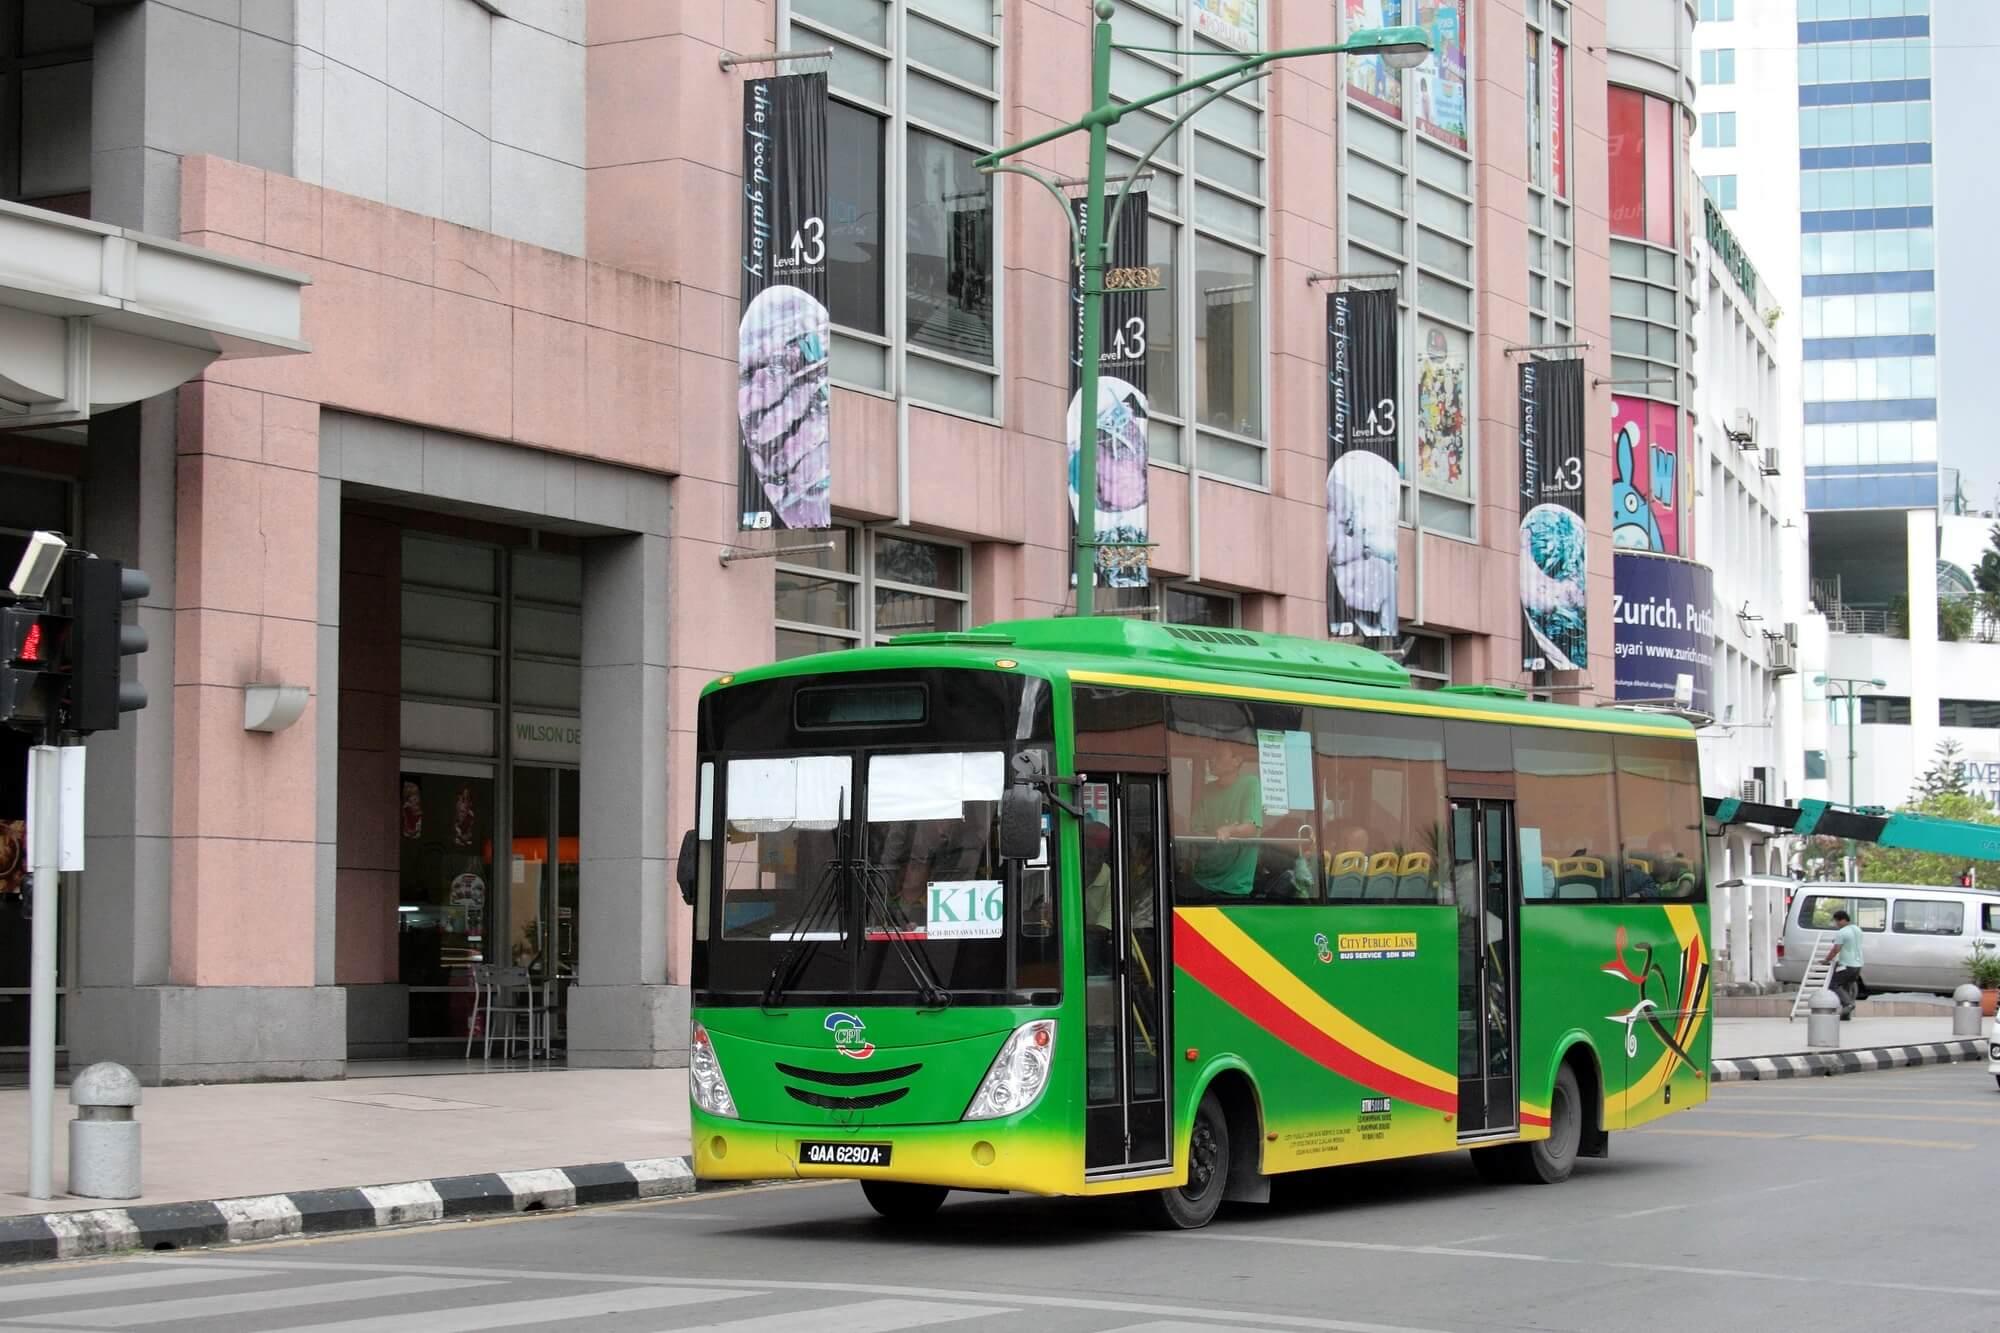 Tambang Bas Henti Henti Di Sarawak Kini Hanya RM1 Untuk 1 Perjalanan